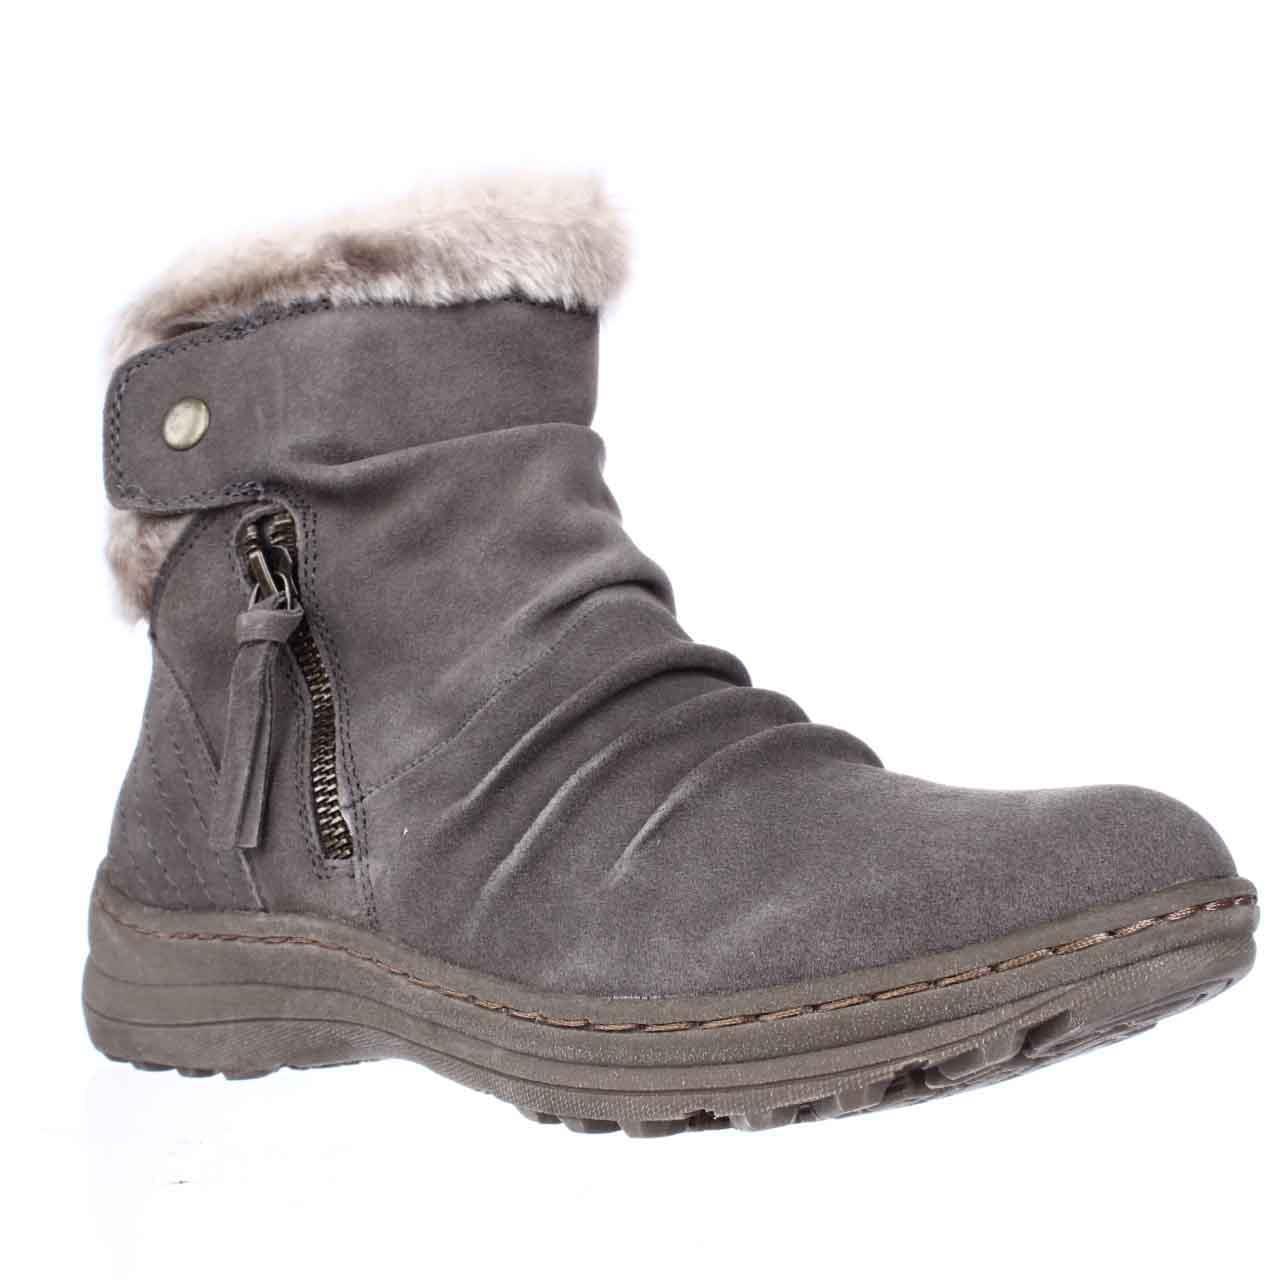 Womens BareTraps Amelya Short Snow Boots Mushroom by BareTraps